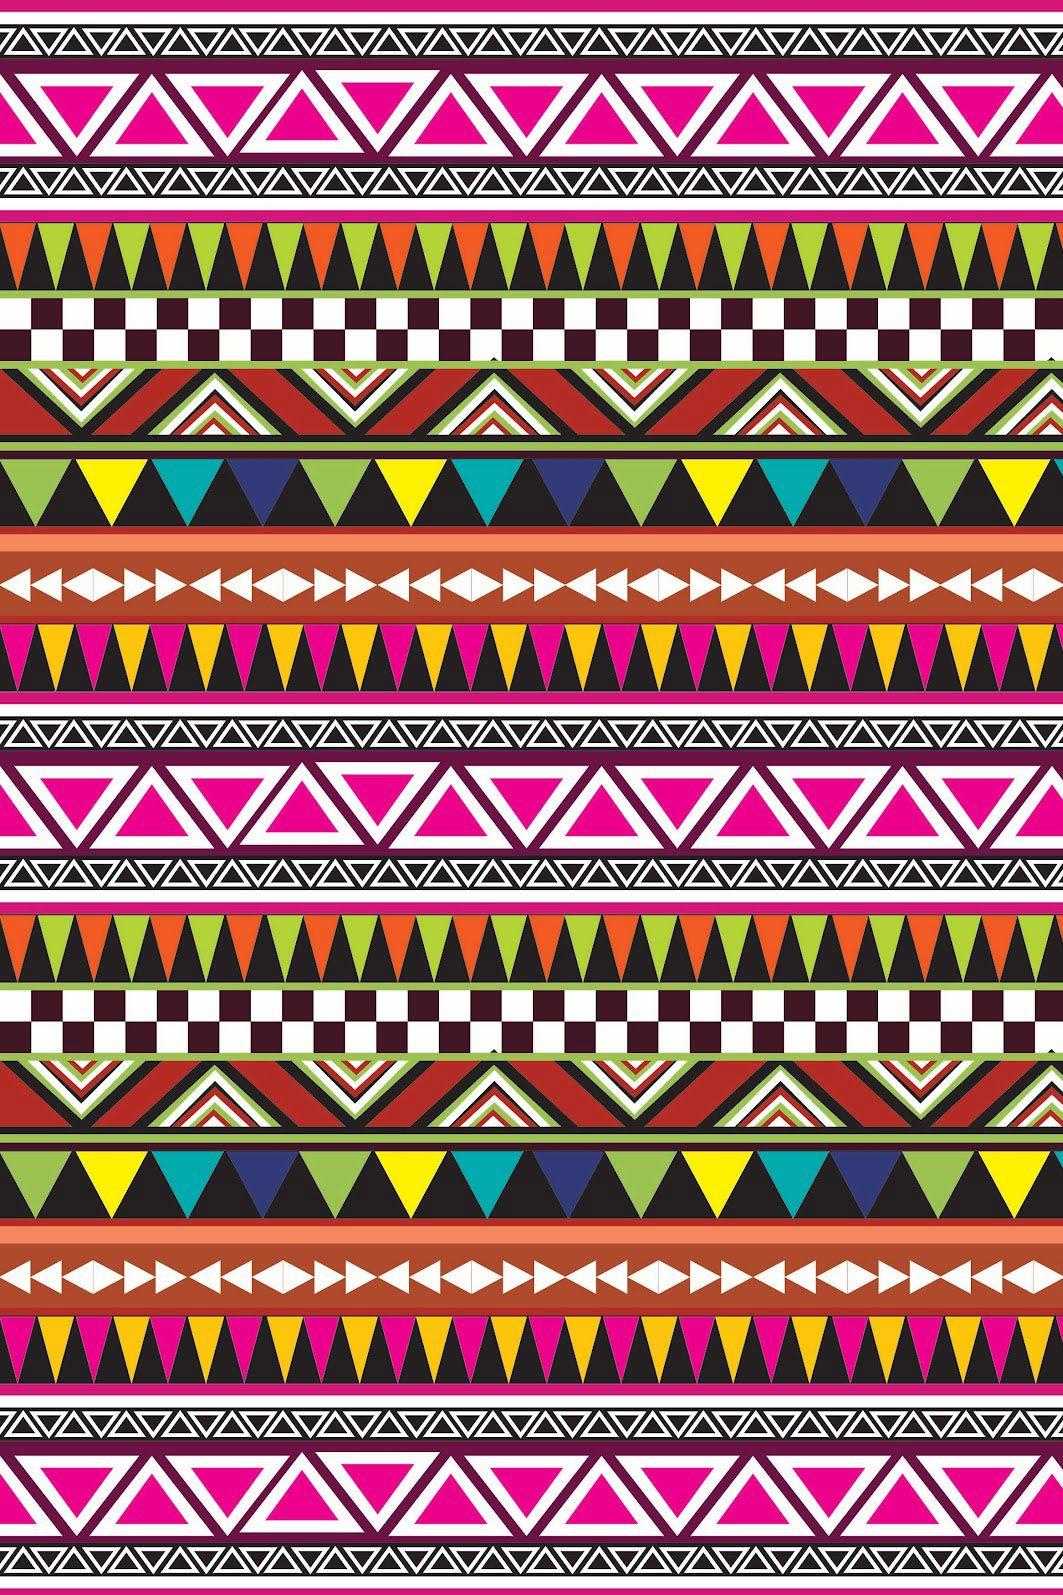 Tribal pattern wallpaper tumblr viewing gallery